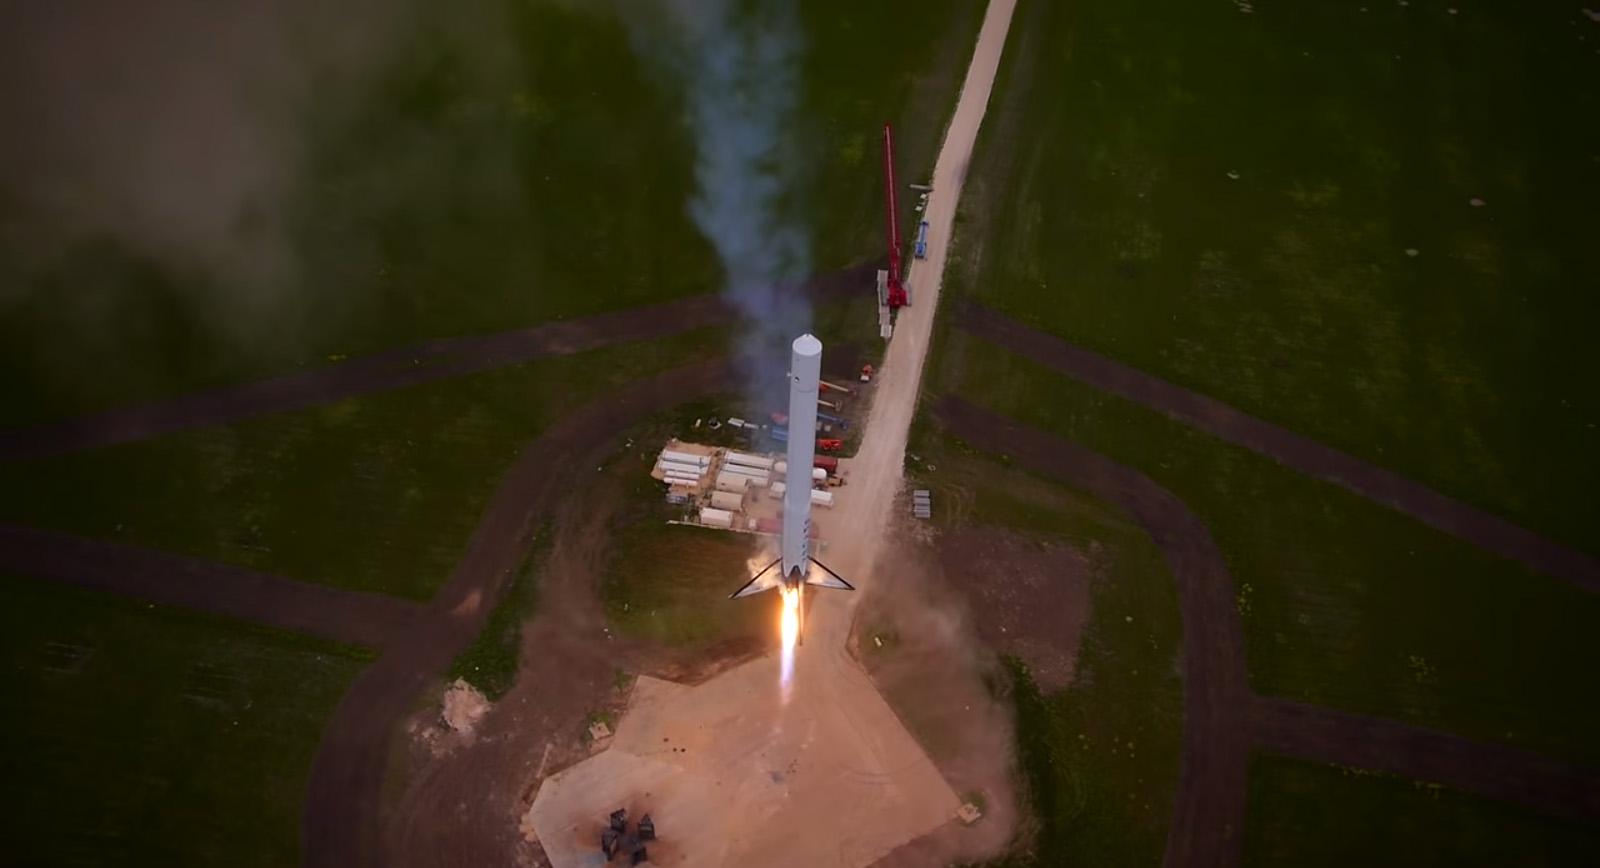 SpaceX F9R Reusable Rocket Descends